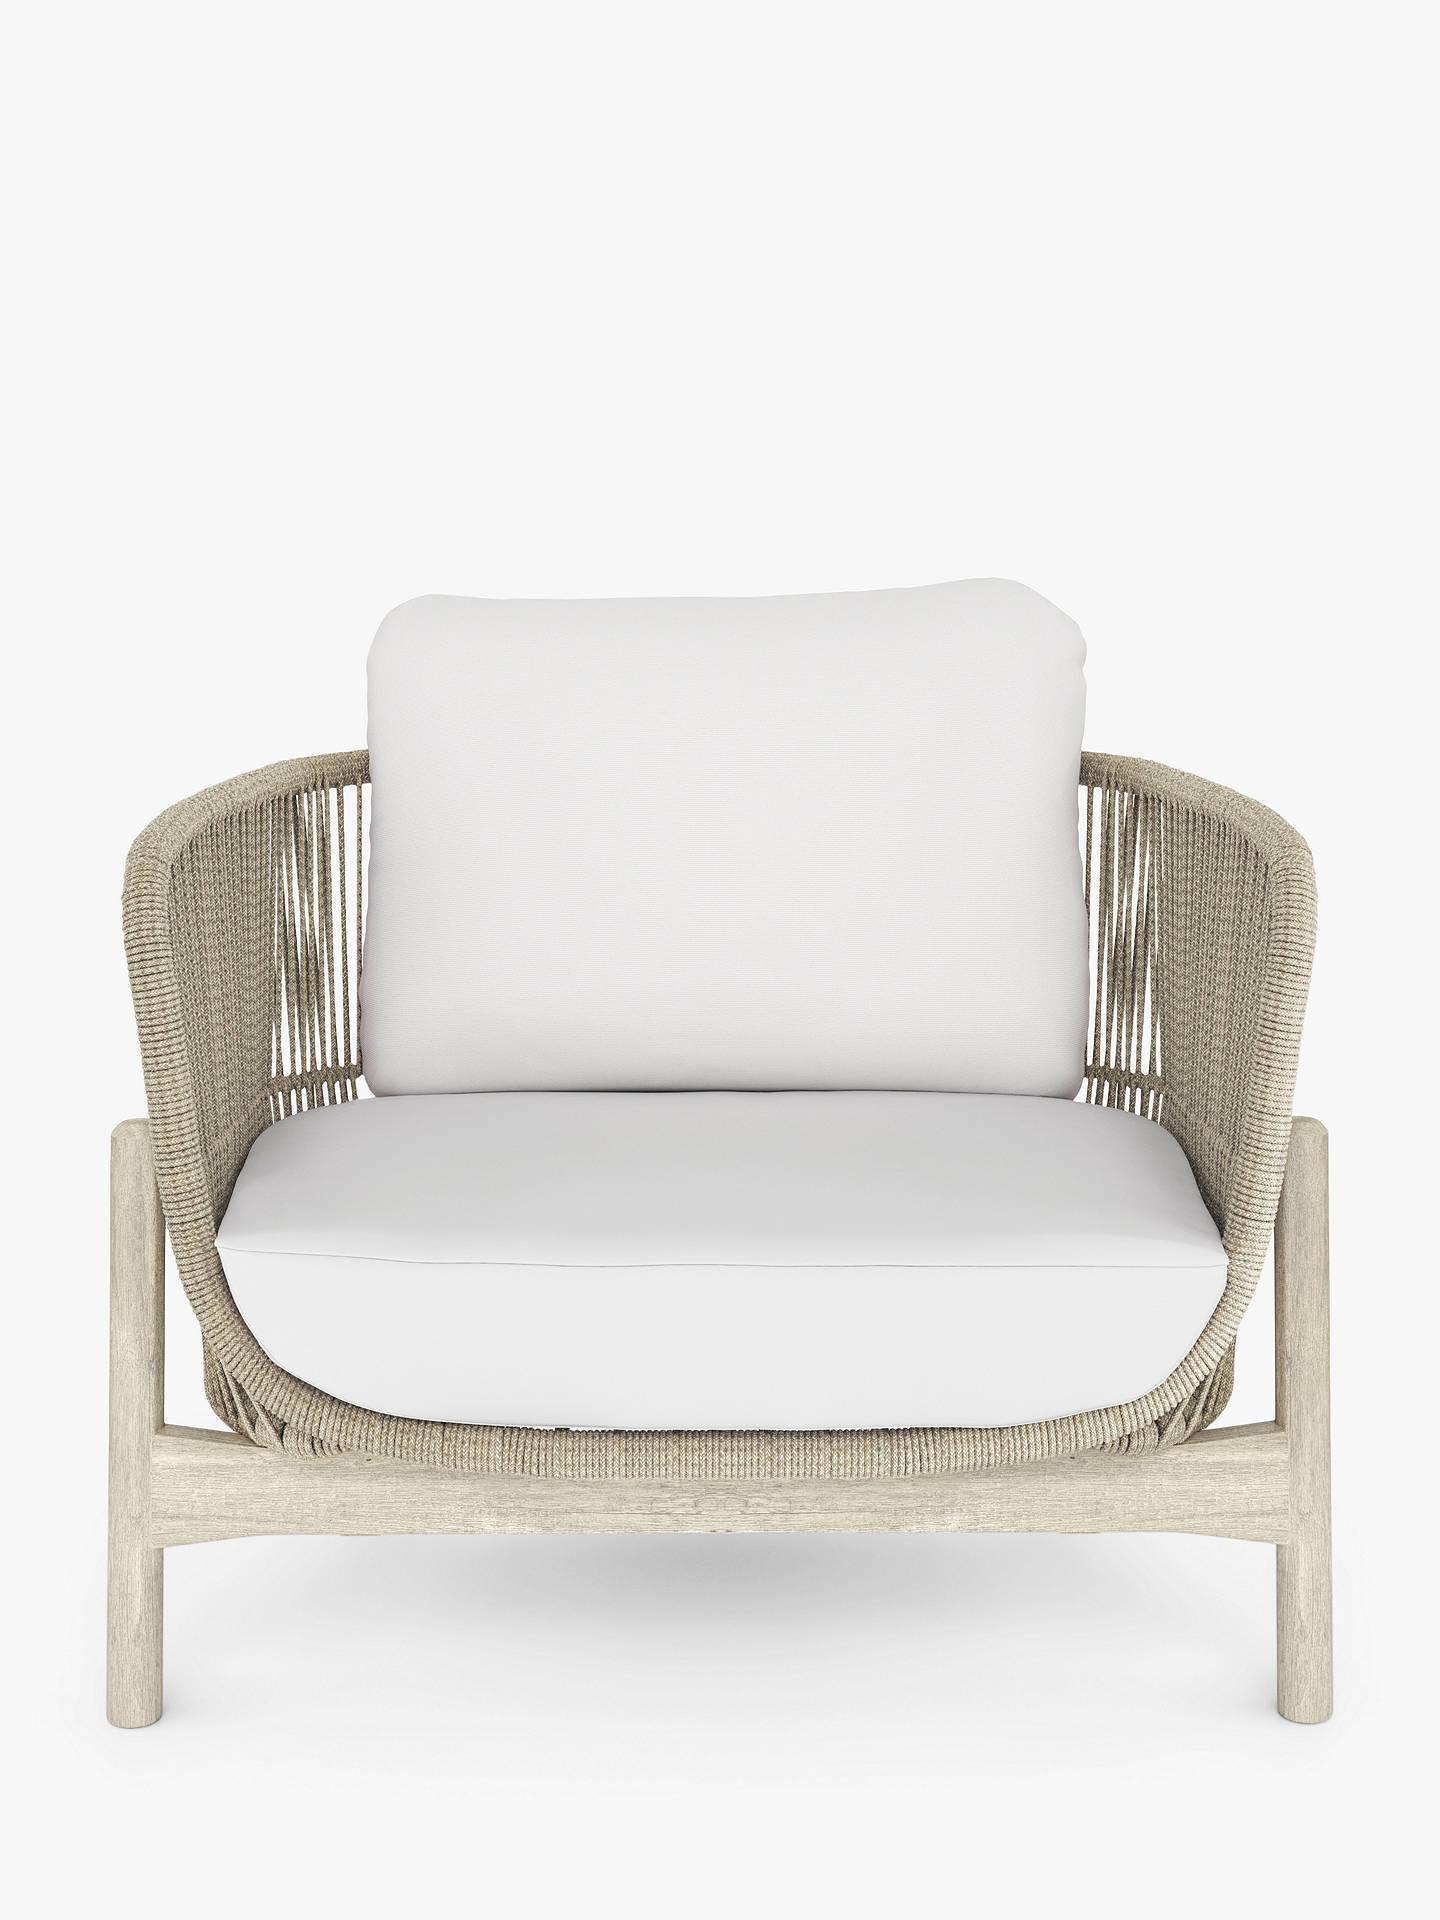 John Lewis & Partners Cradle Rope Garden Sofa, Chairs ...